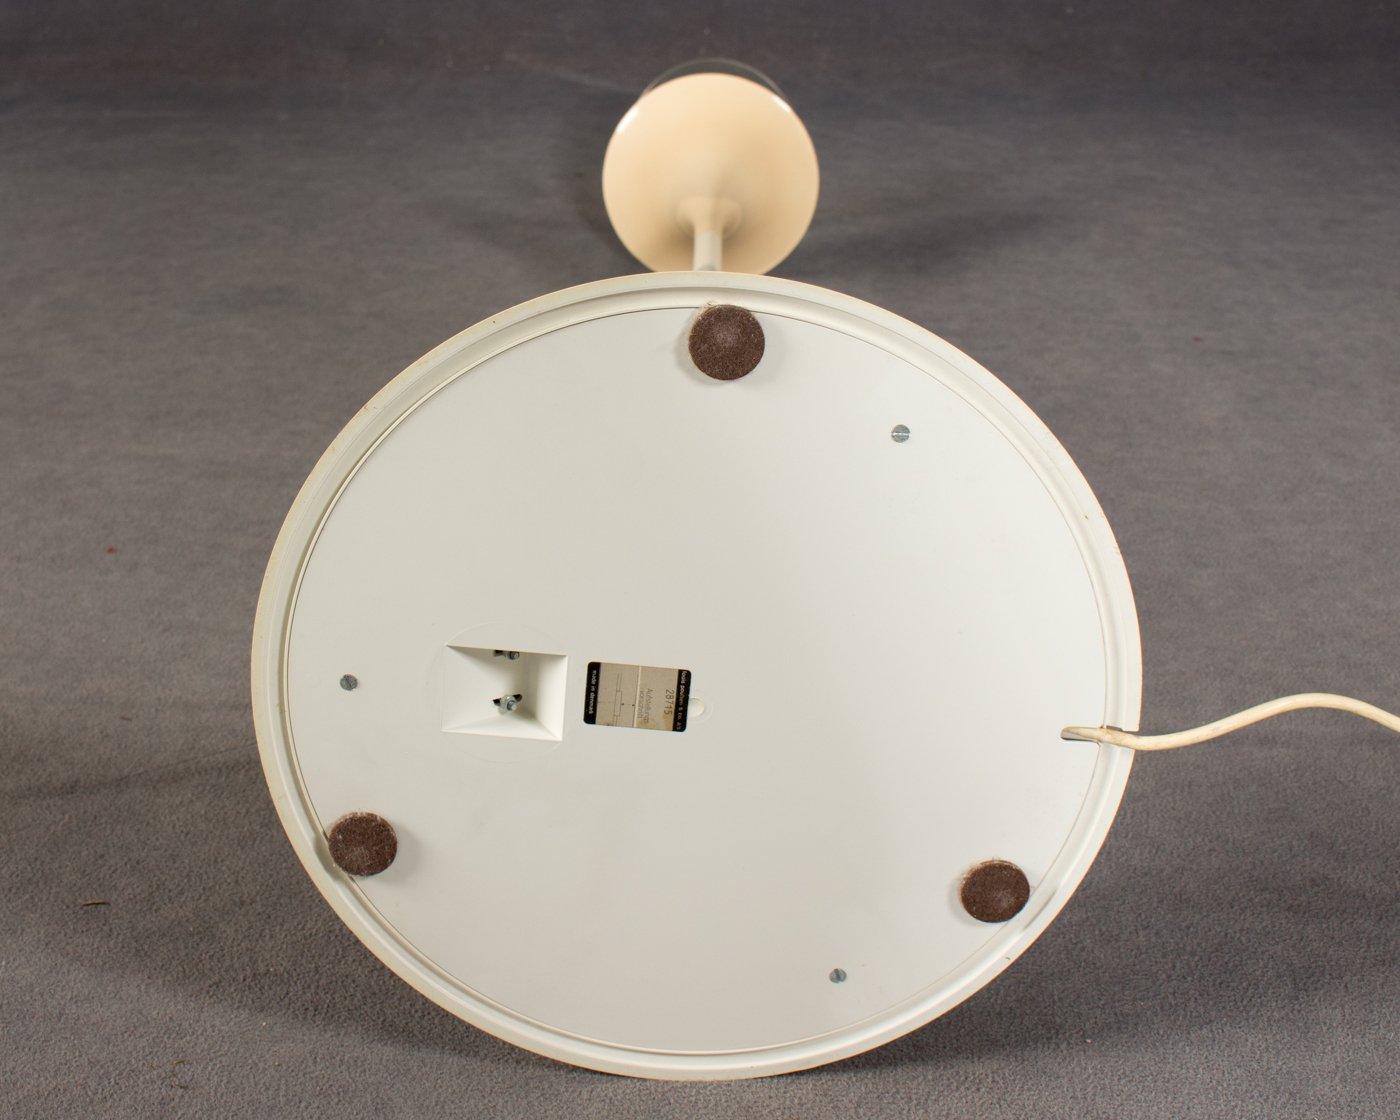 mid century panthella stehlampe von verner panton f r. Black Bedroom Furniture Sets. Home Design Ideas